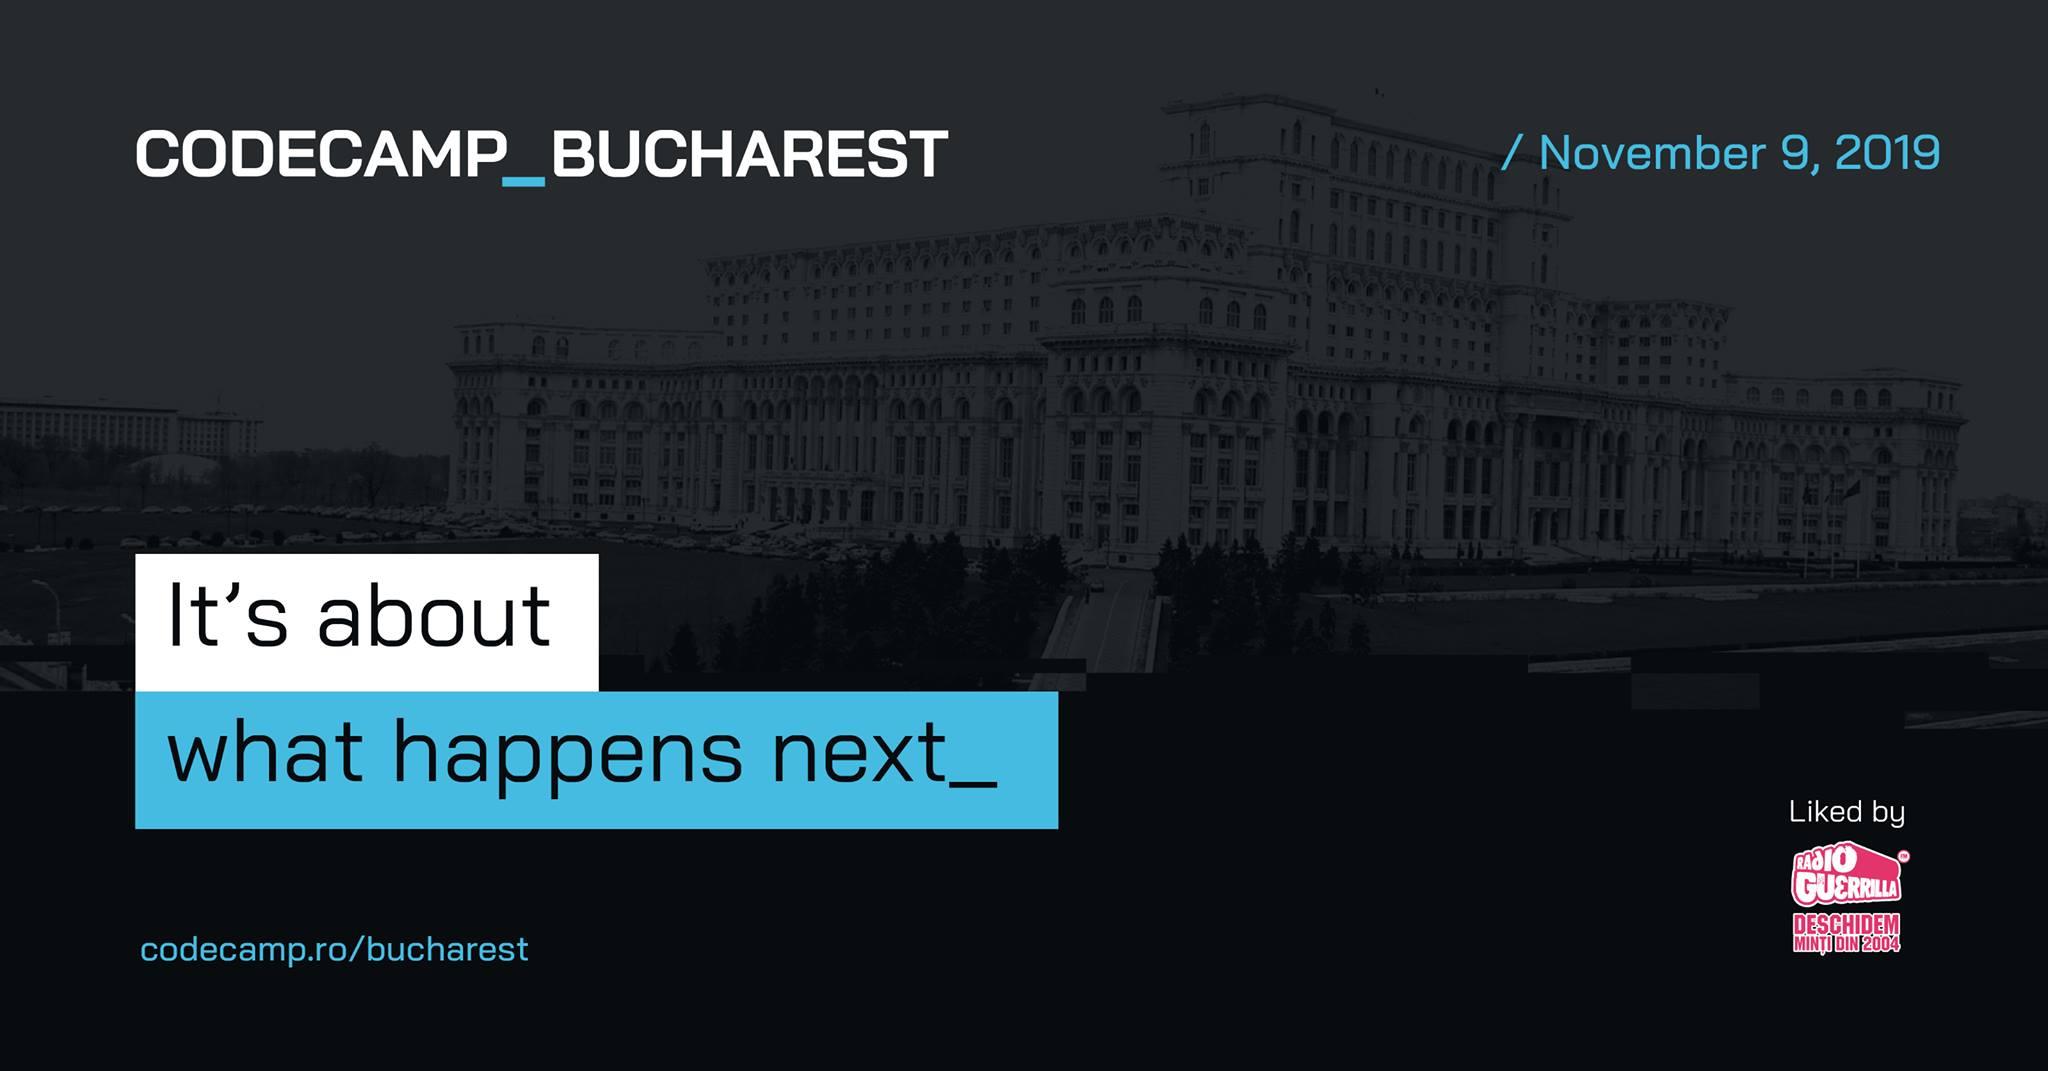 Codecamp Bucharest